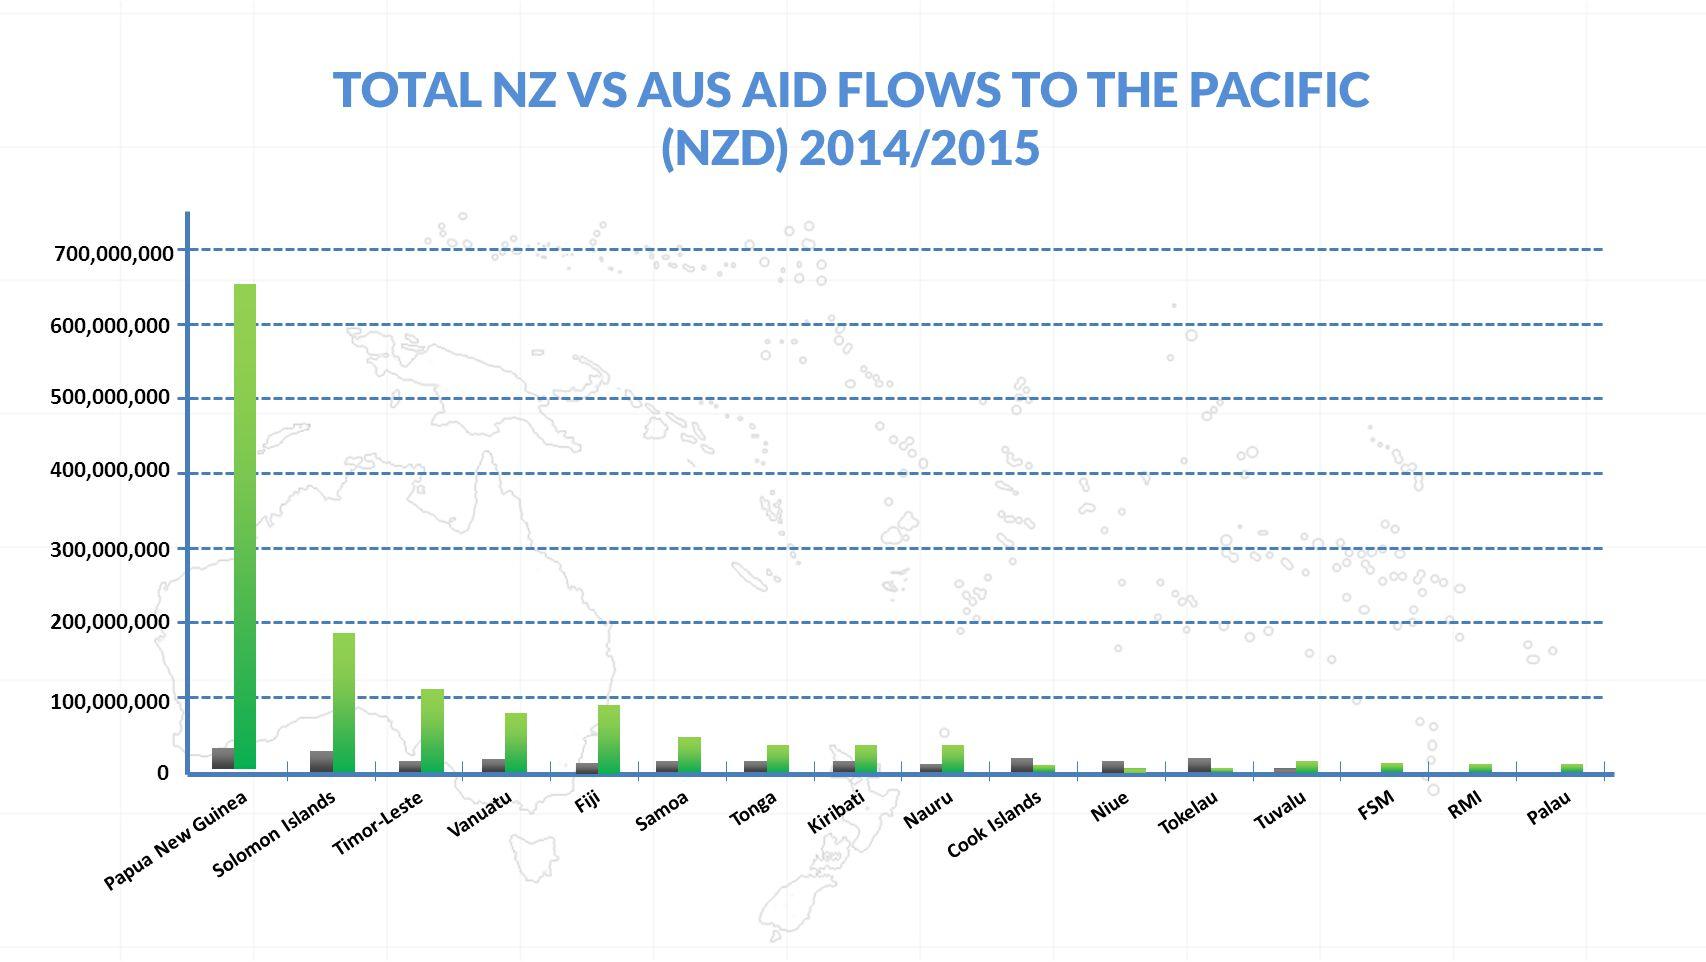 TOTAL NZ VS AUS AID FLOWS TO THE PACIFIC (NZD) 2014/2015 Papua New GuineaSolomon IslandsTimor-LesteVanuatuFijiSamoaTongaKiribatiNauruCook IslandsNiueT